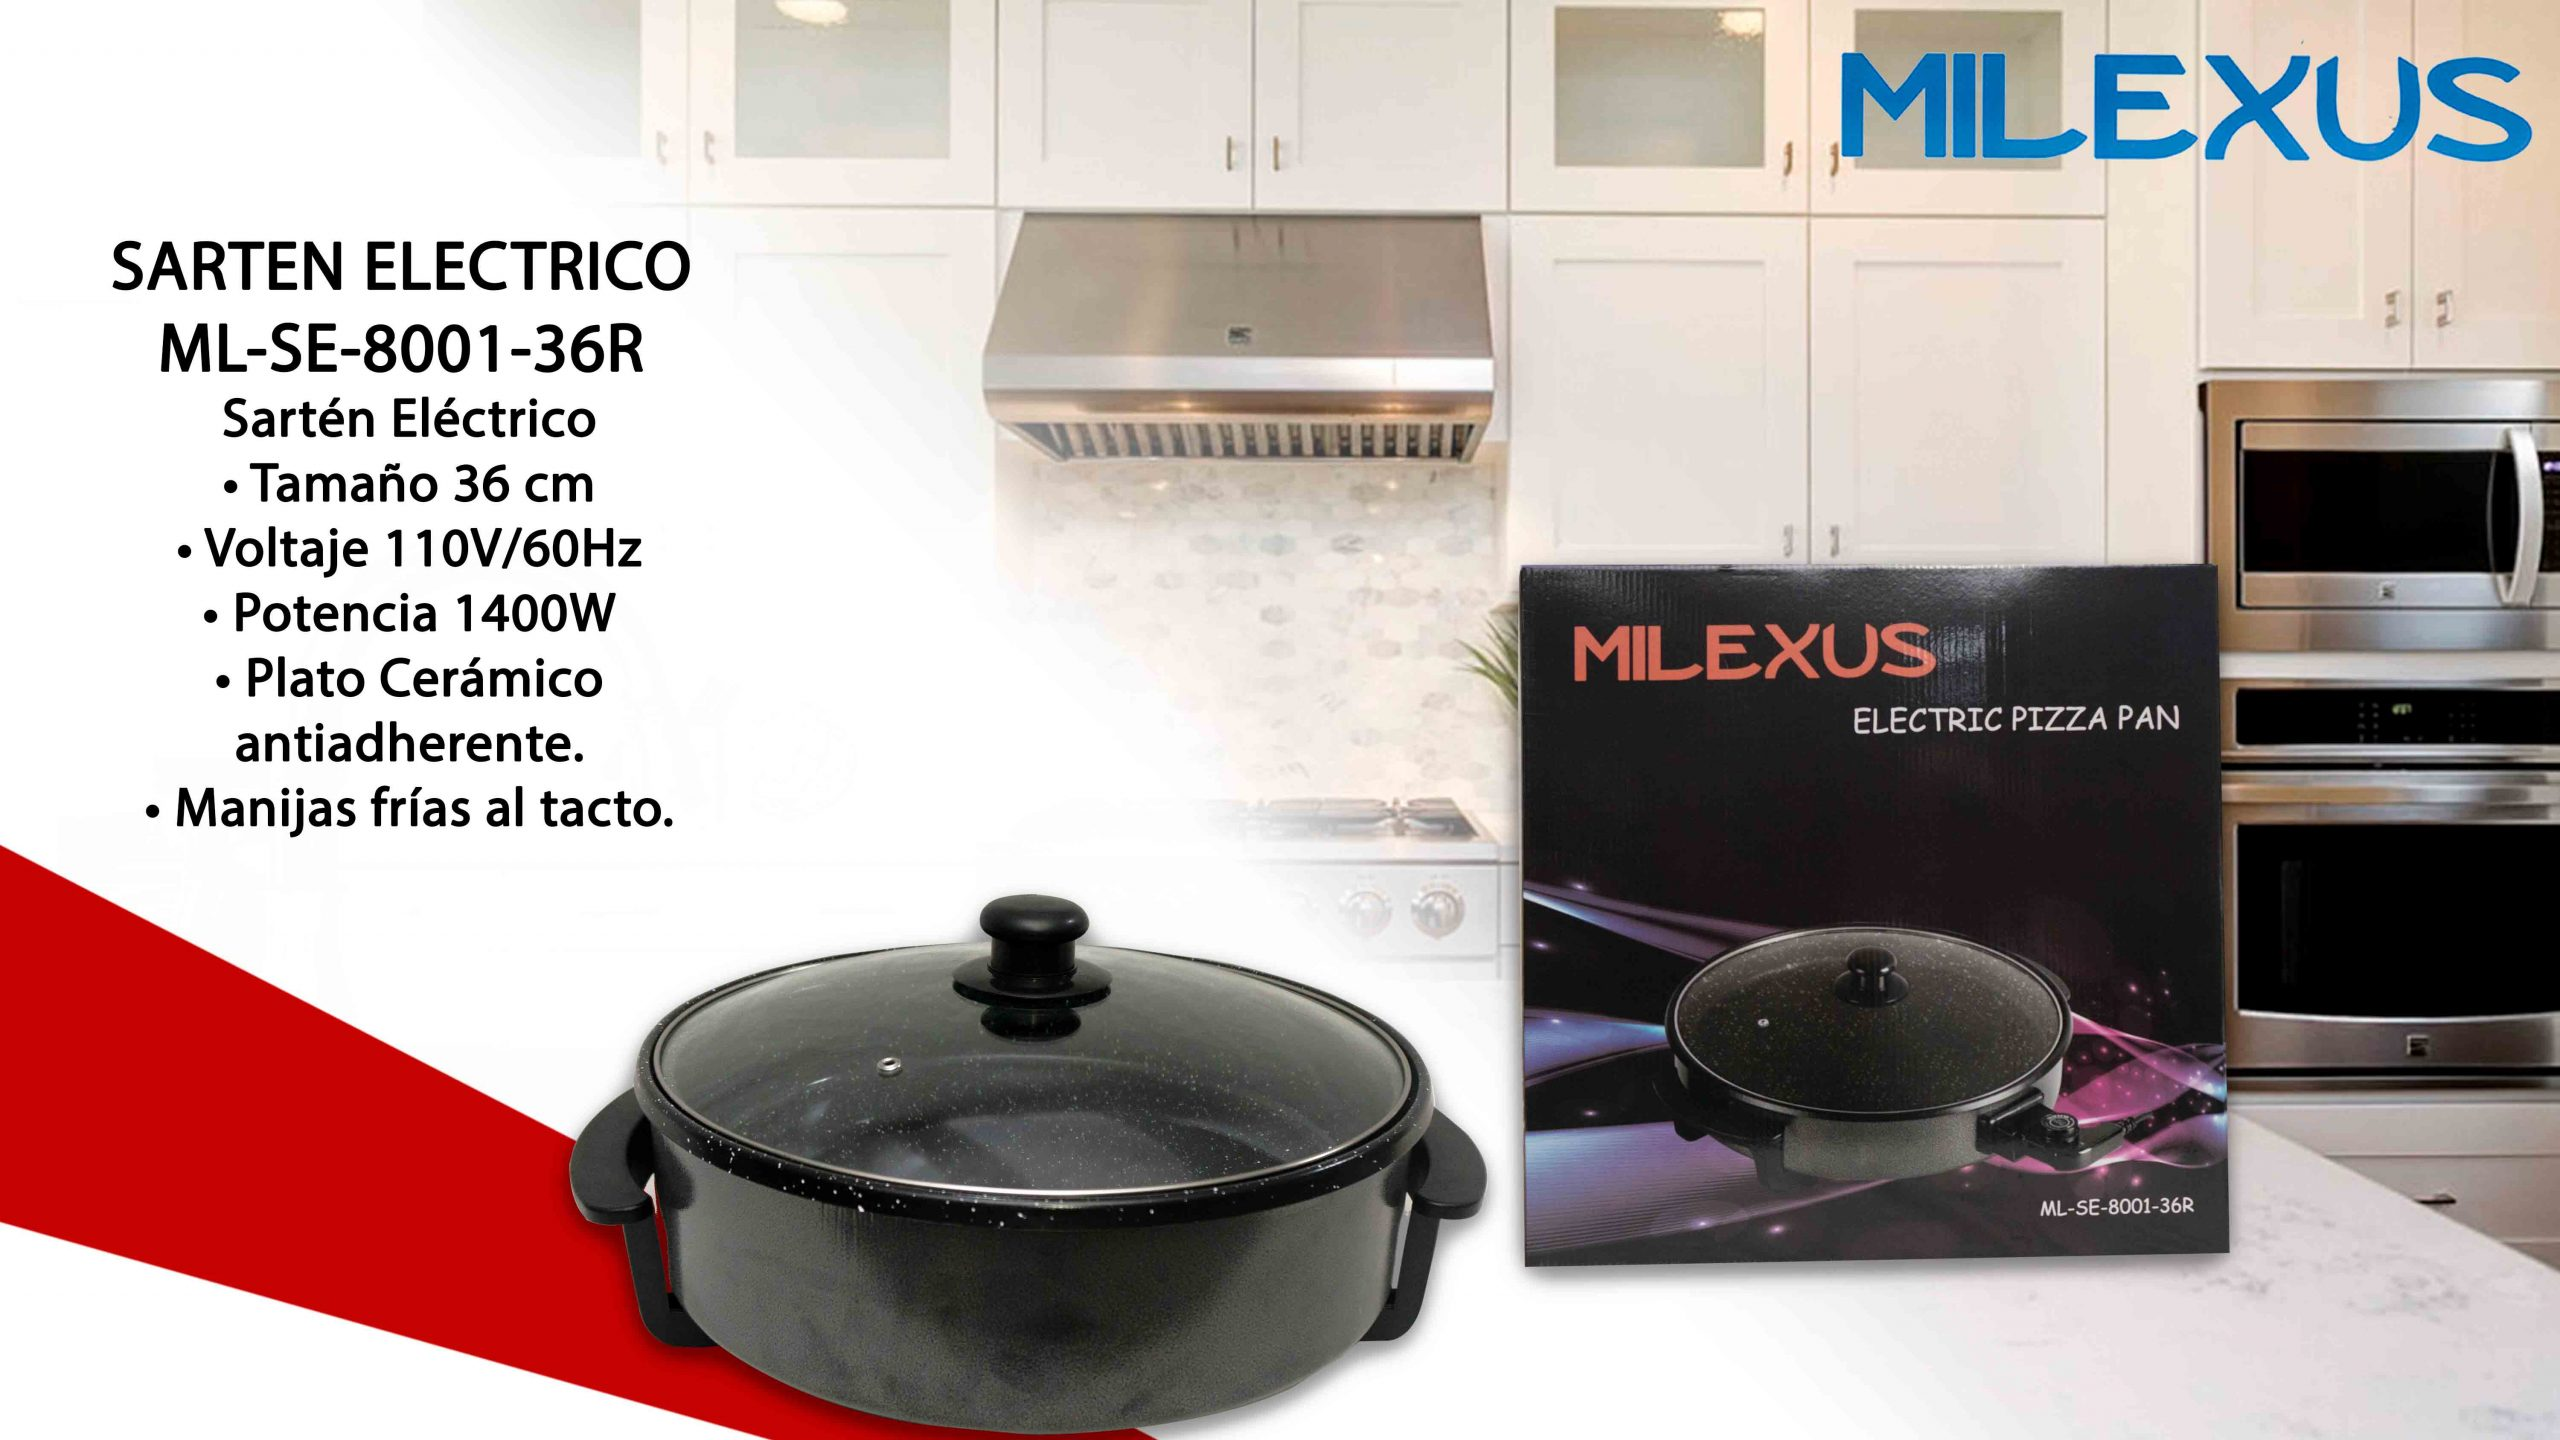 Milexus Electric Pizza Pan B Singh Trading